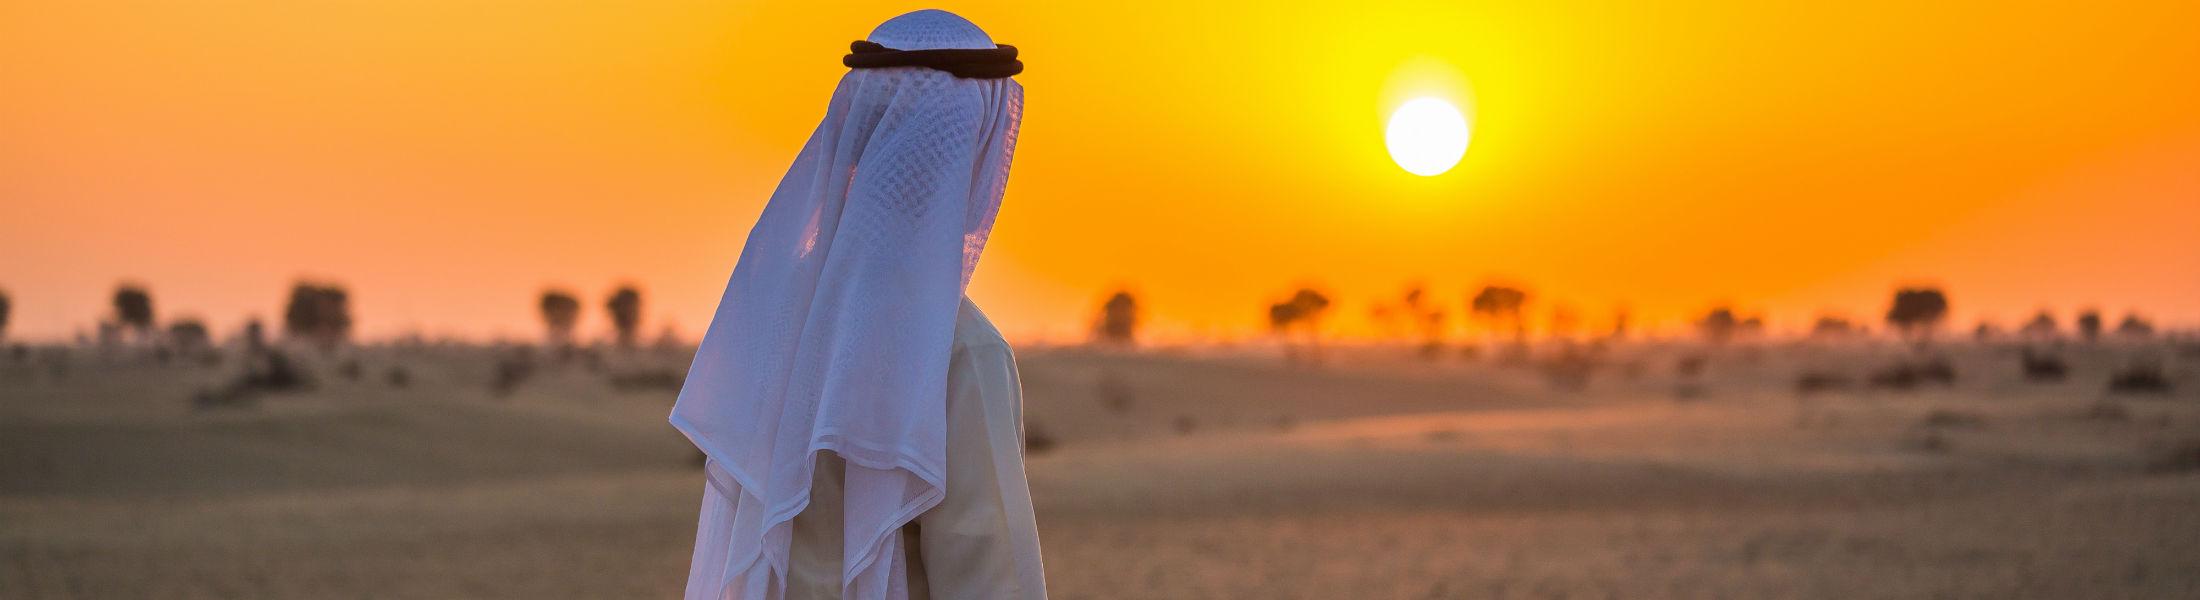 Arabian desert on a hot sunny day